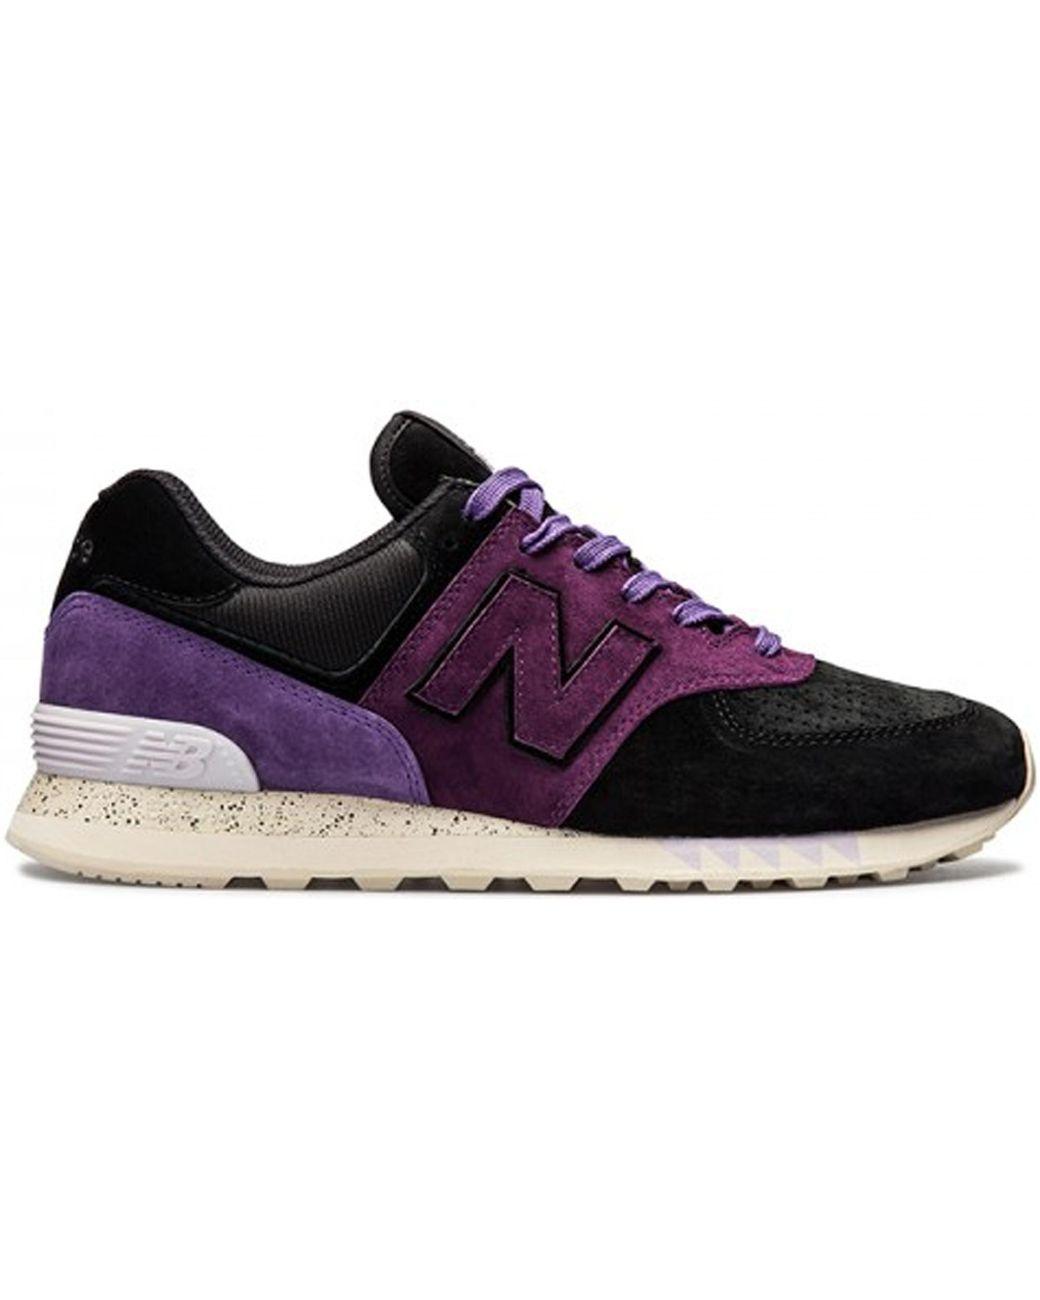 innovative design b72c0 0865c Men's Purple 574 Sneaker Freaker Tassie Devil